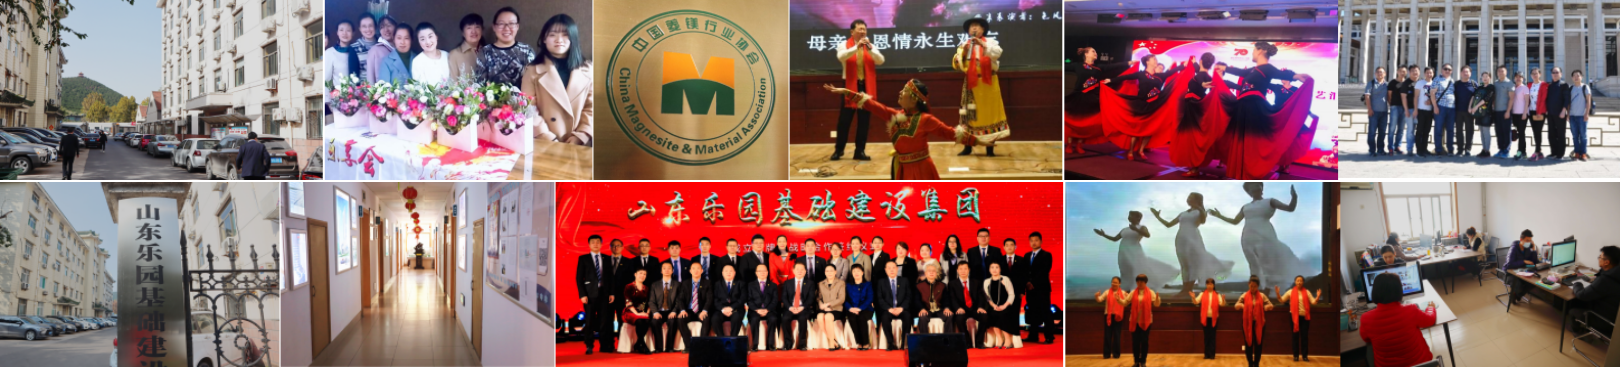 lanchuang company